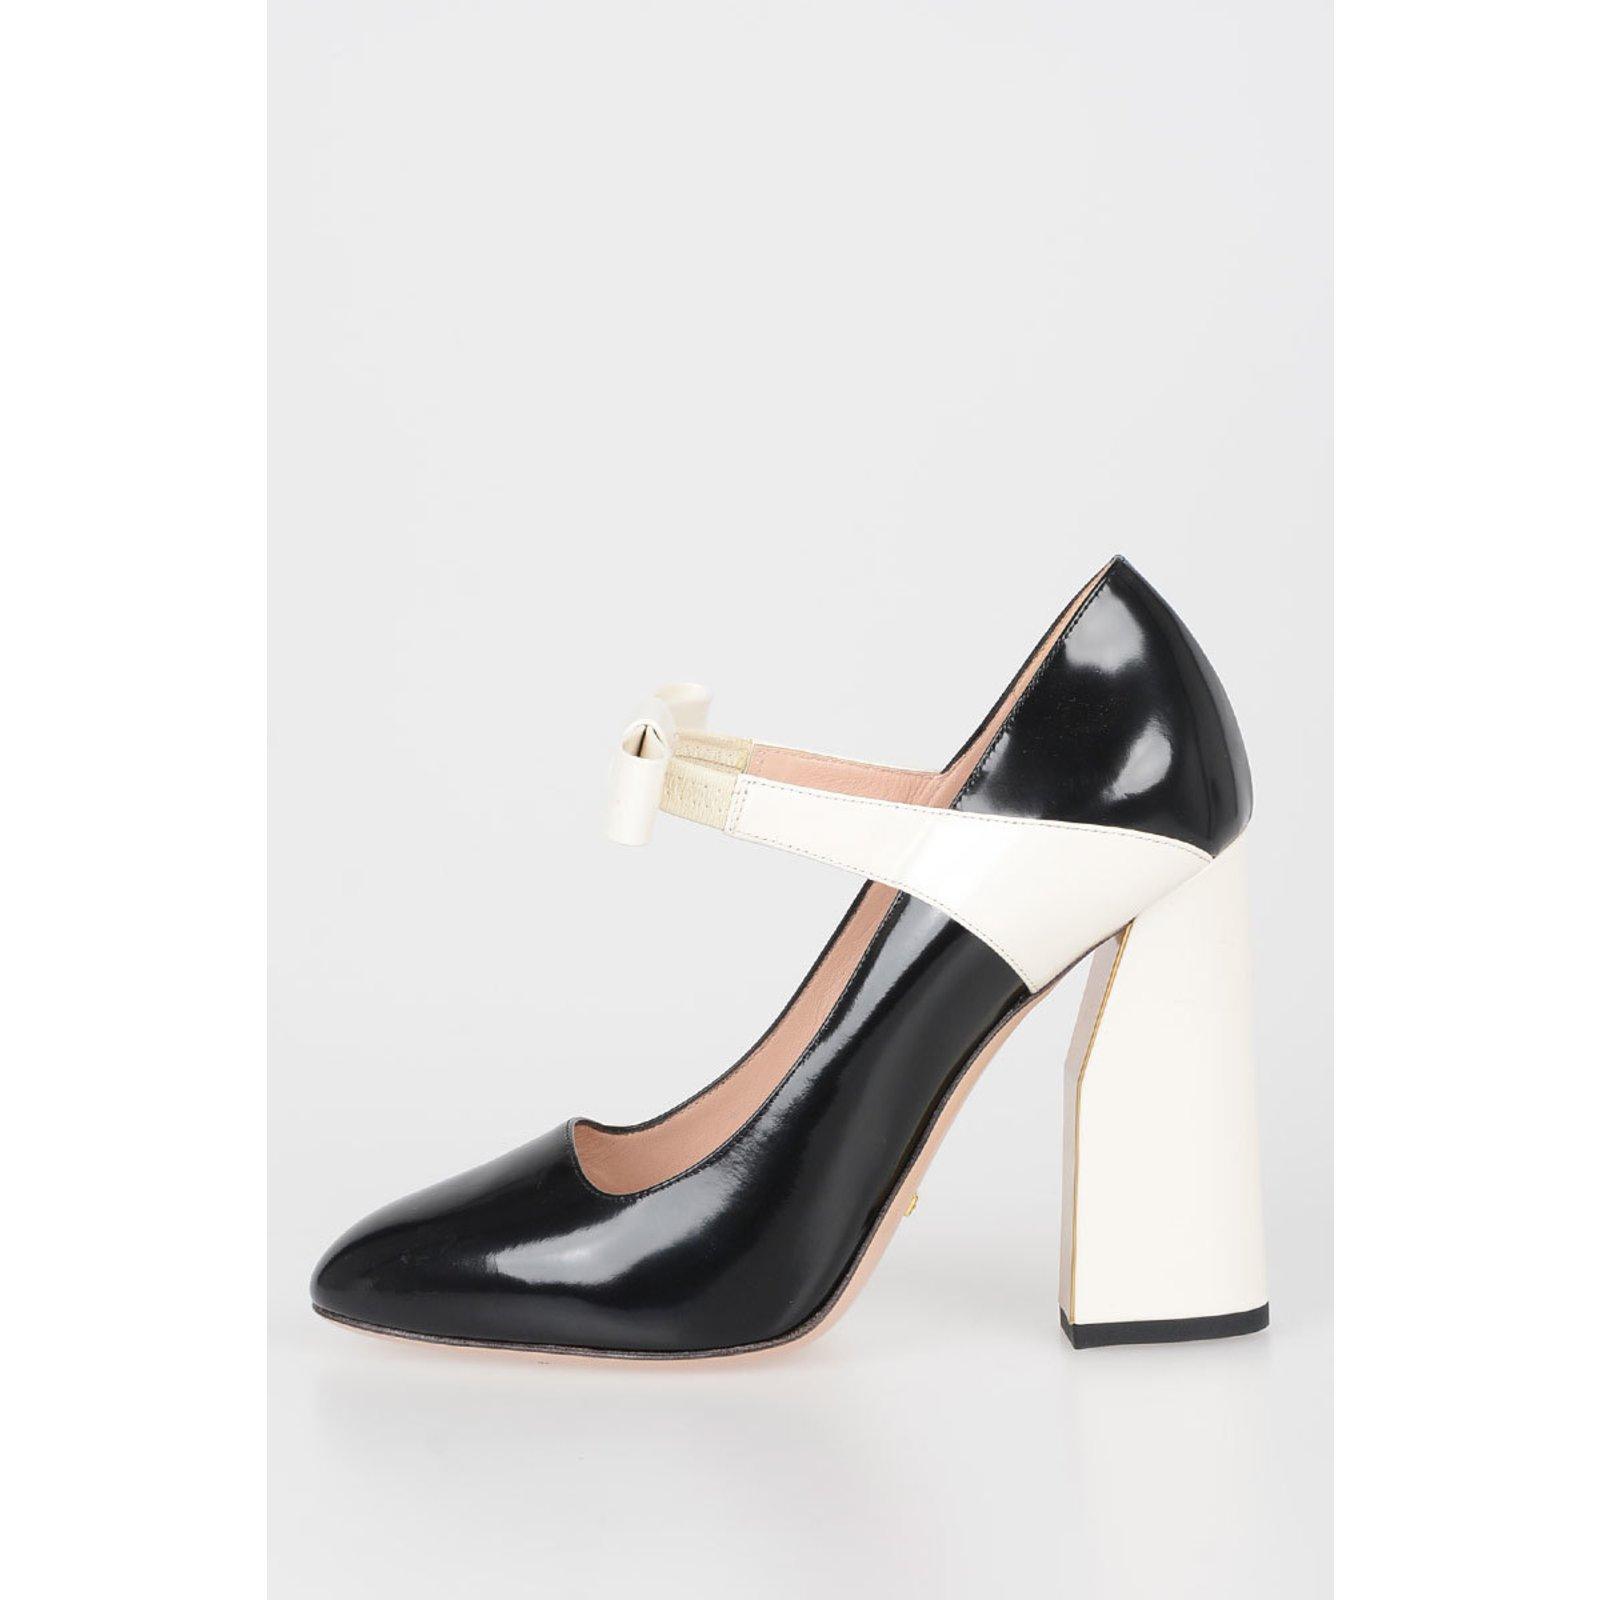 57d4ef25ce4d Gucci Gucci shoes new Heels Leather Other ref.107297 - Joli Closet